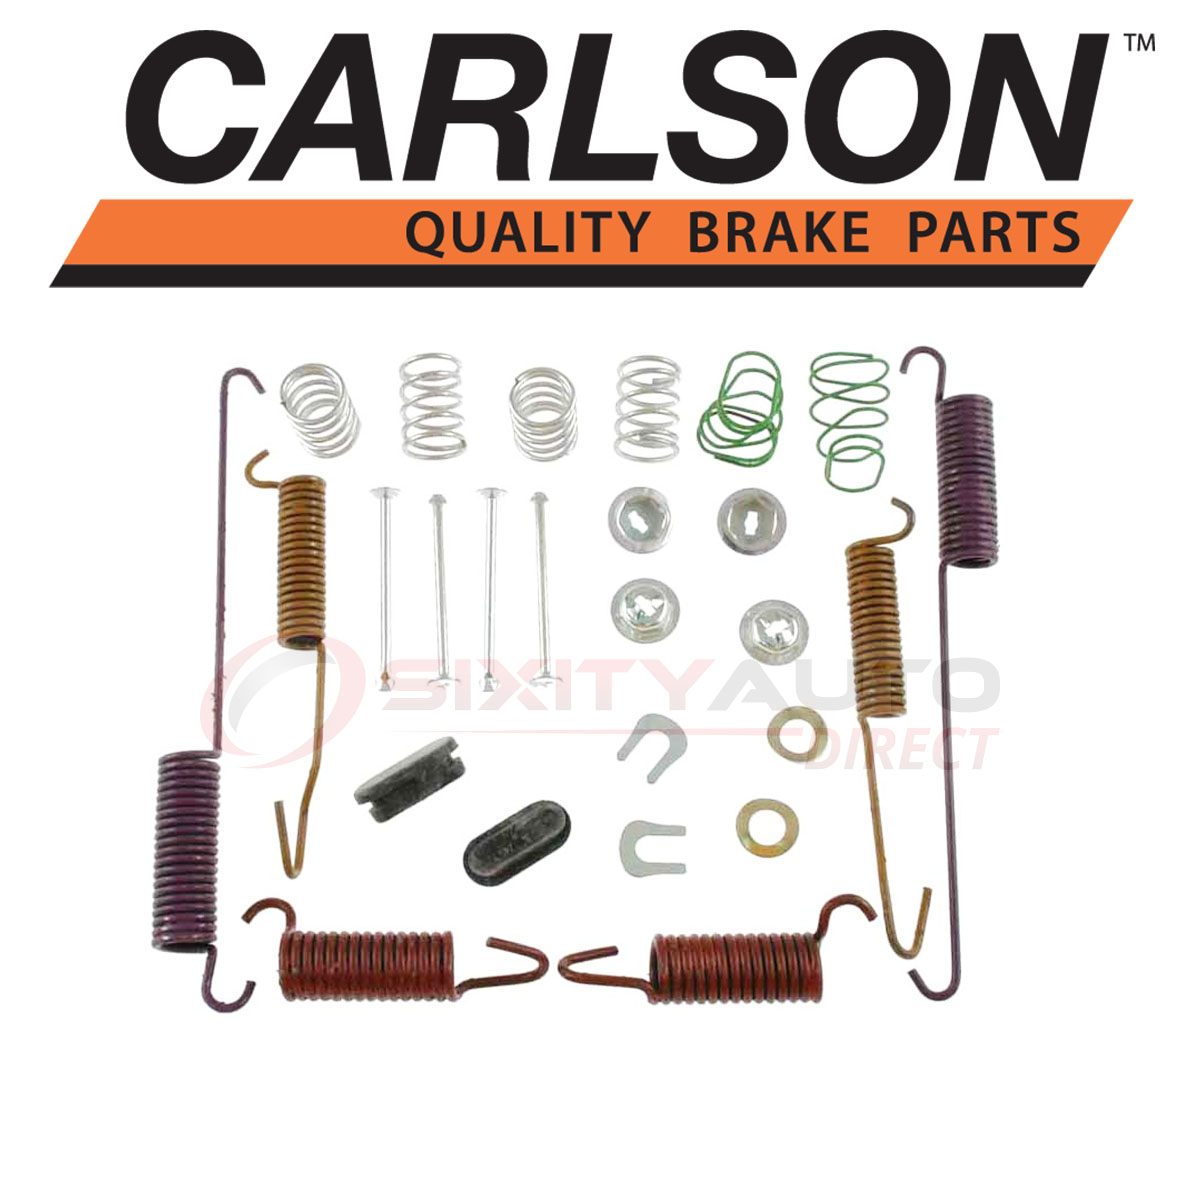 Shoe ar Carlson Rear Drum Brake Hardware Kit for 1994-1999 Dodge Ram 3500